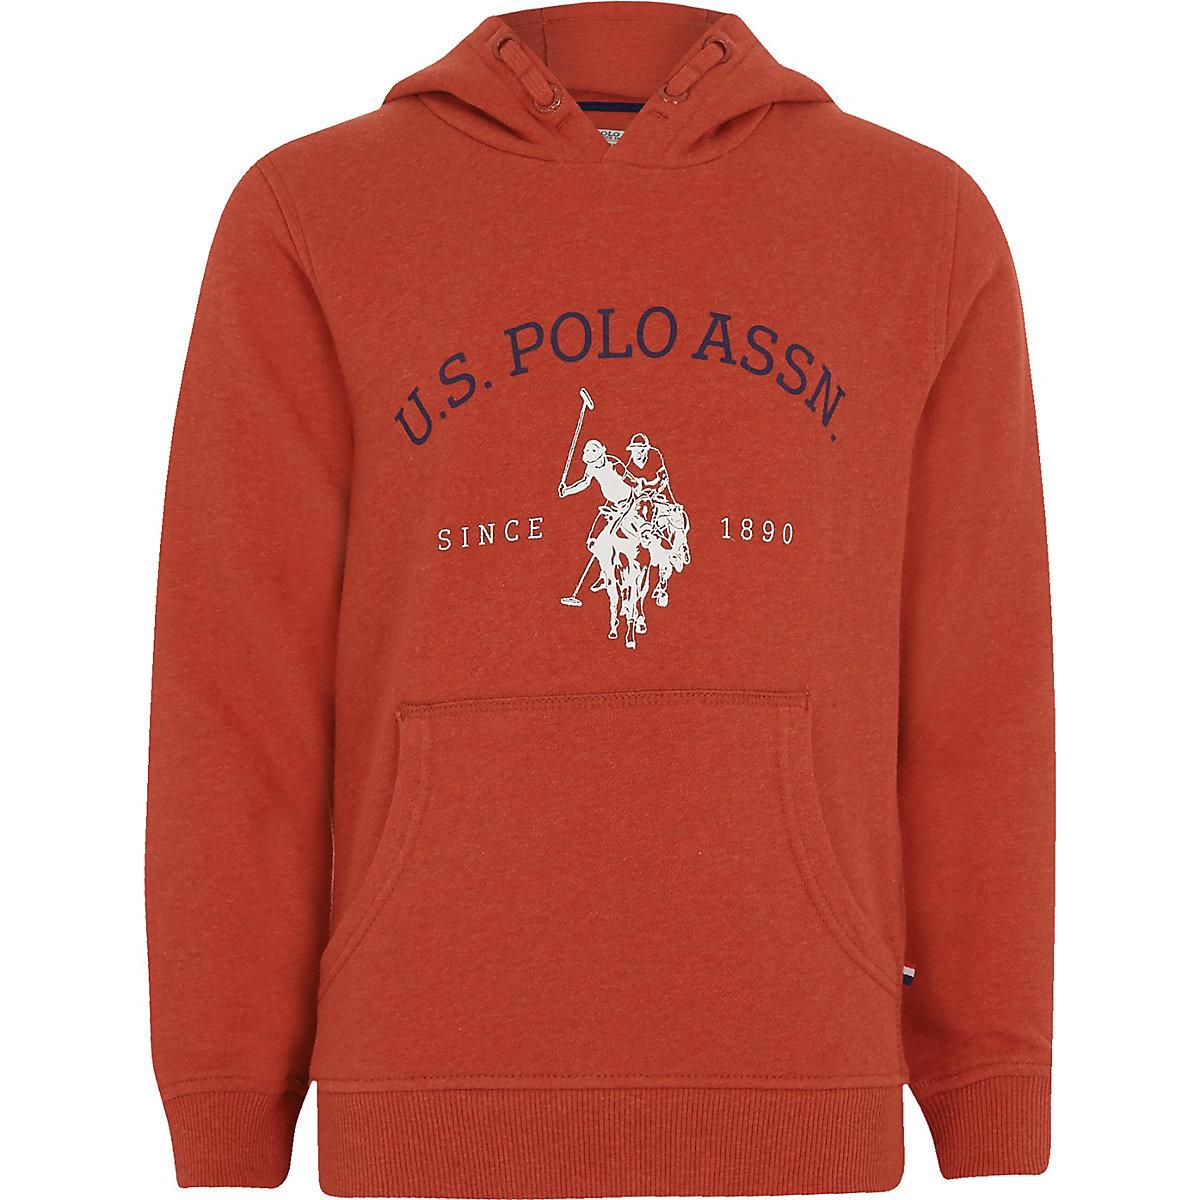 Boys red 'U.S. Polo Assn.' hoodie